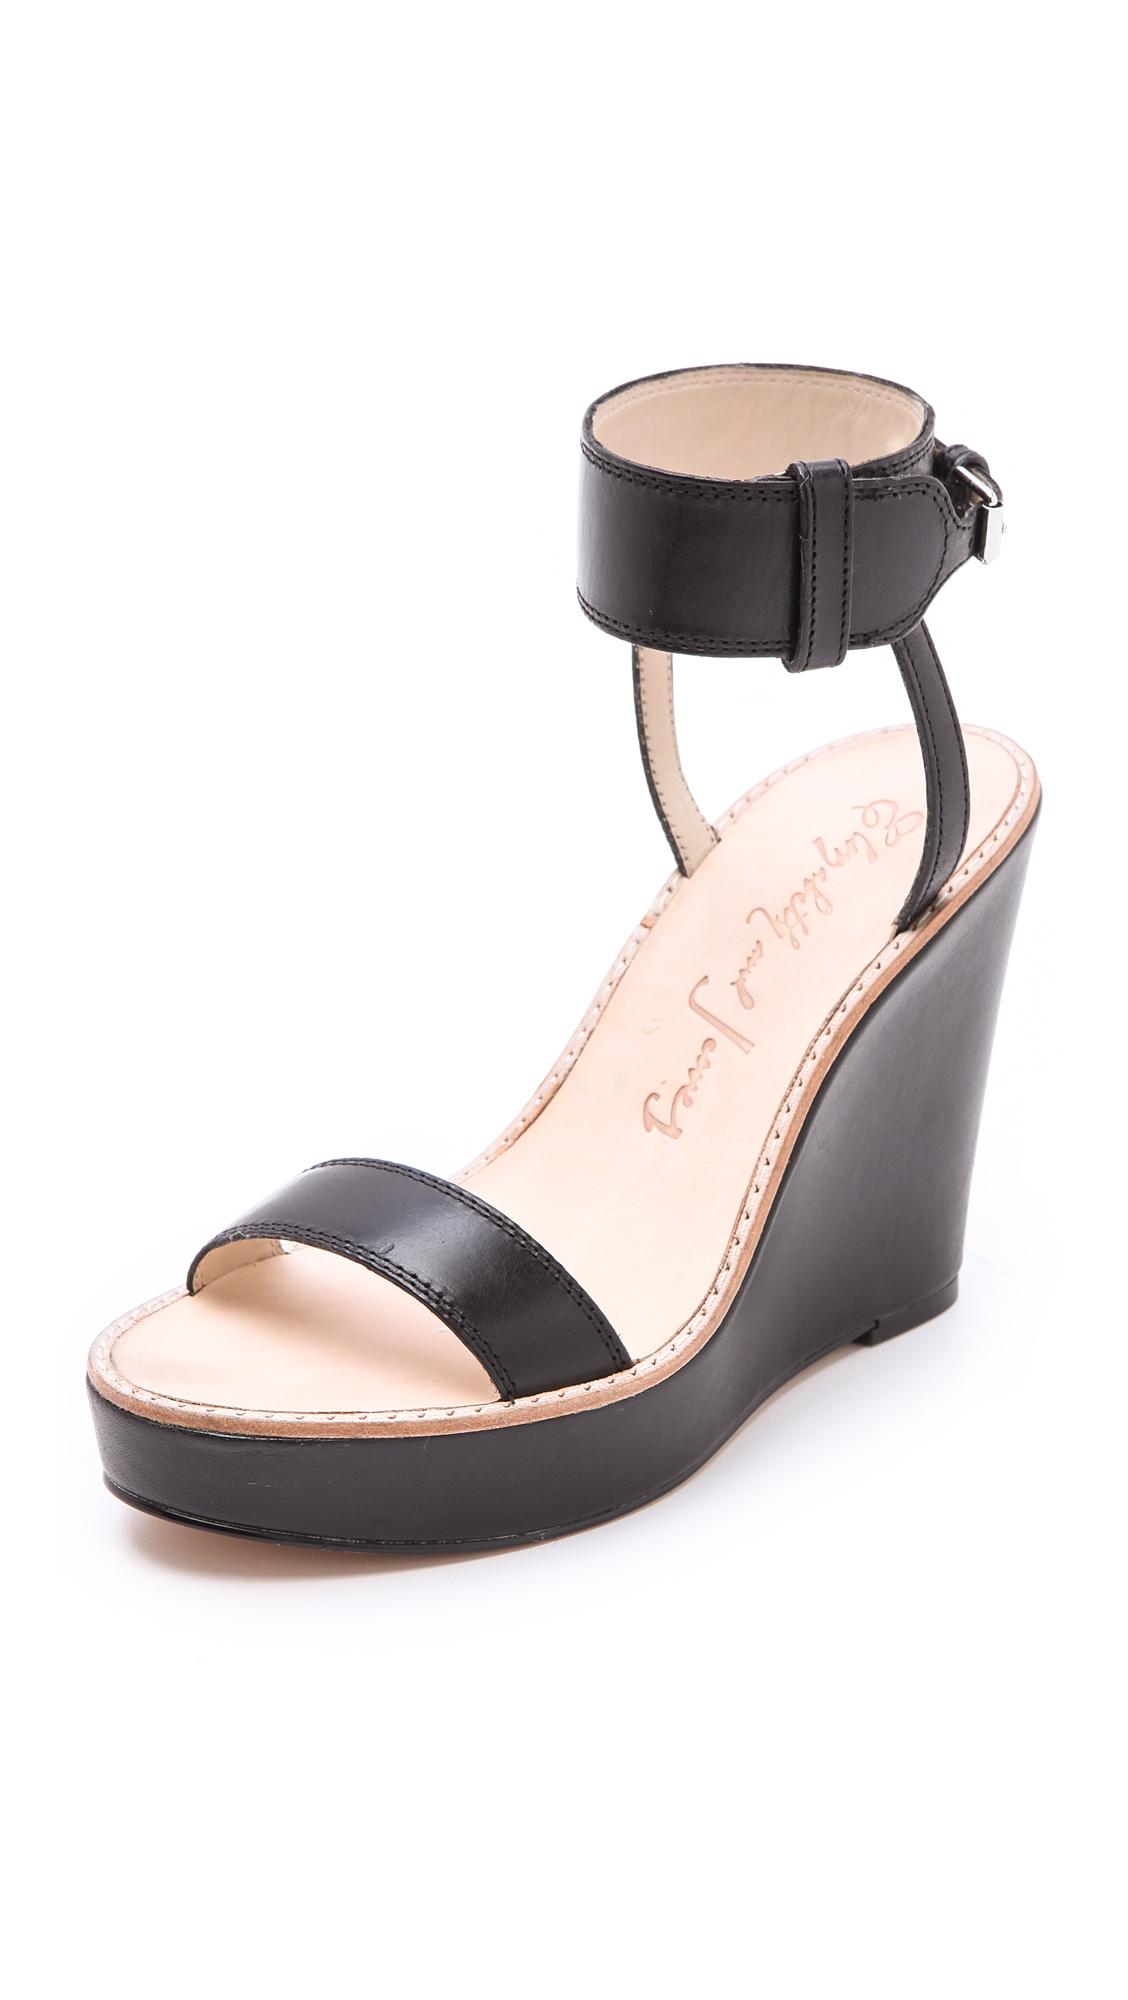 5445e4b70 Elizabeth and James Brit Wedge Sandals